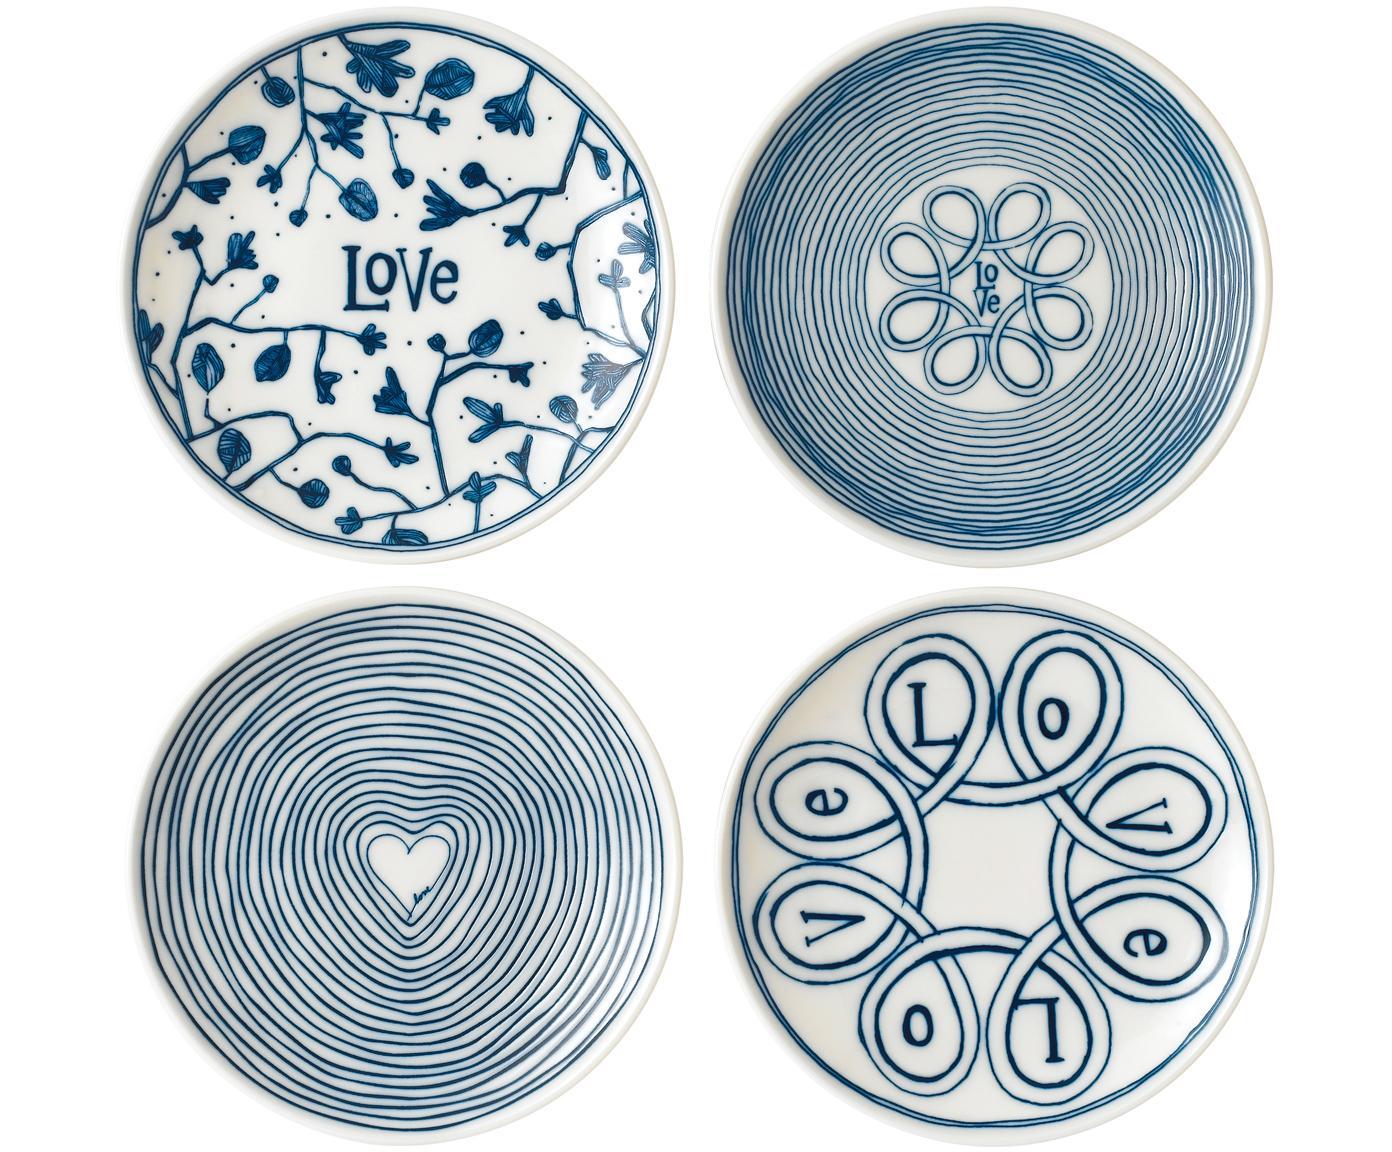 Set 4 piatti per pane bianco/blu Love, Porcellana, Avorio, blu cobalto, Ø 16 cm